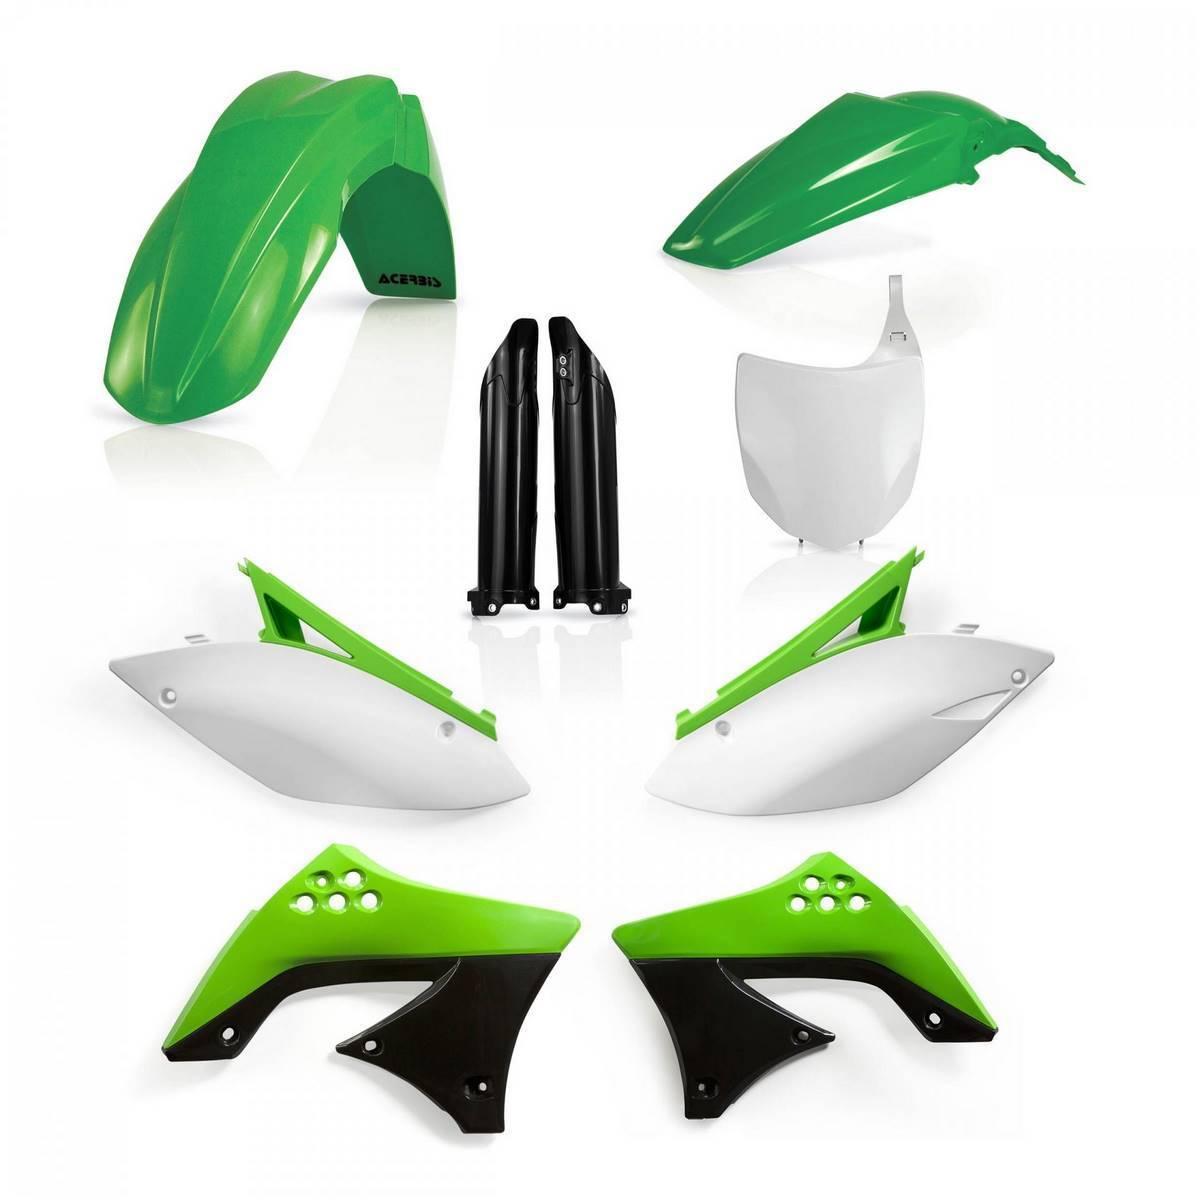 0013981-553 - Full Kit Plasticos Kxf 450 09 11 Origen